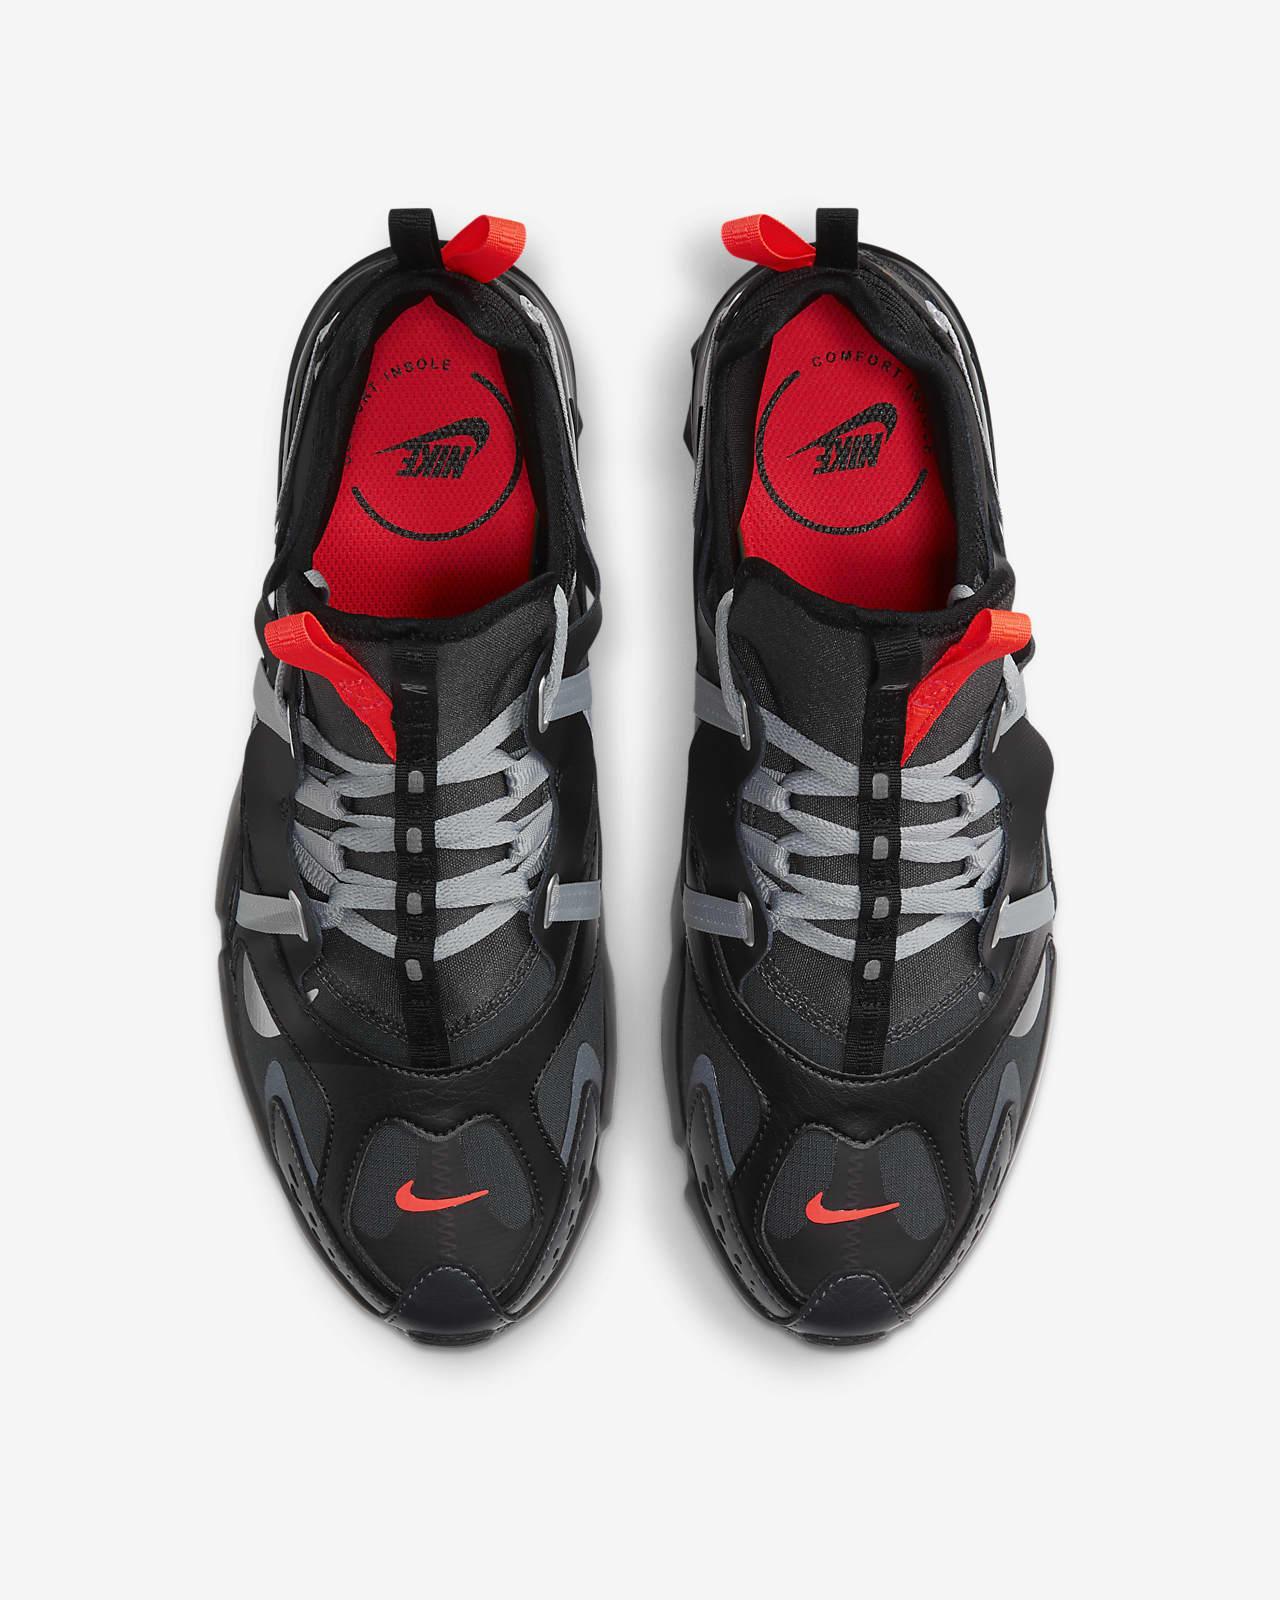 embrague Ambigüedad meteorito  Calzado para hombre Nike Air Max Infinity Winter. Nike MX